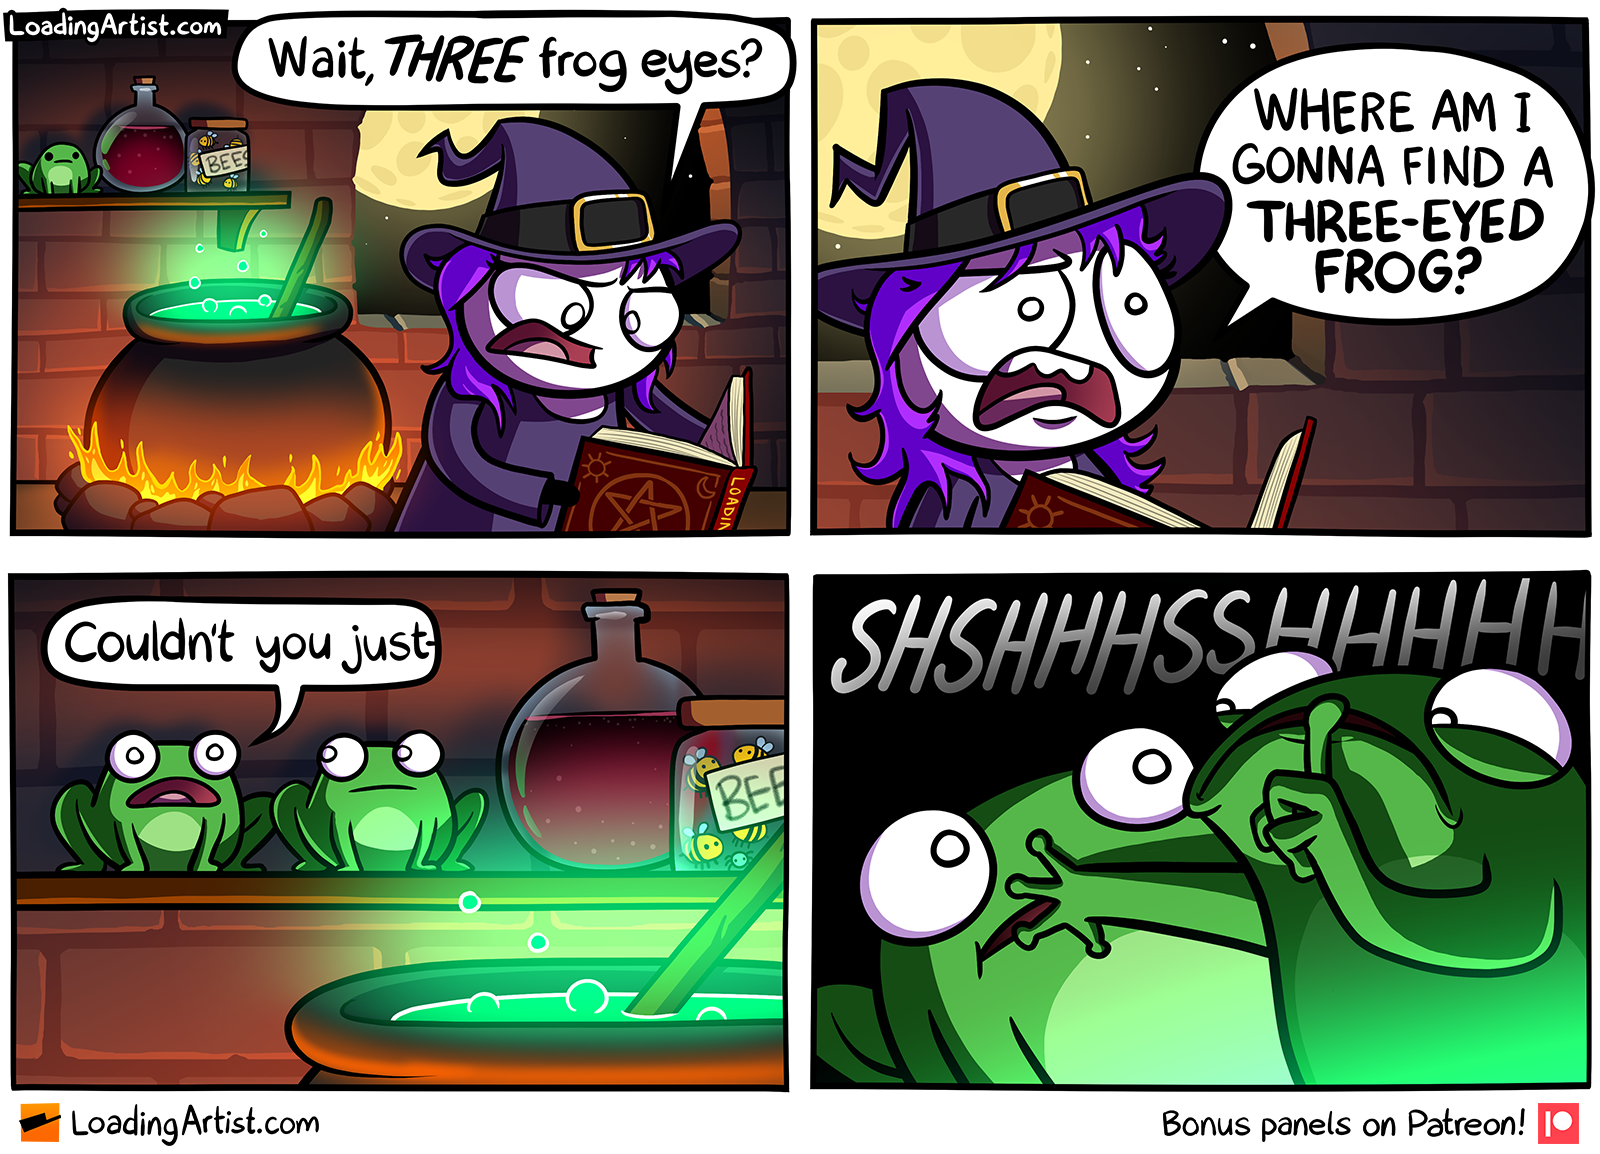 Wait, THREE frog eyes?